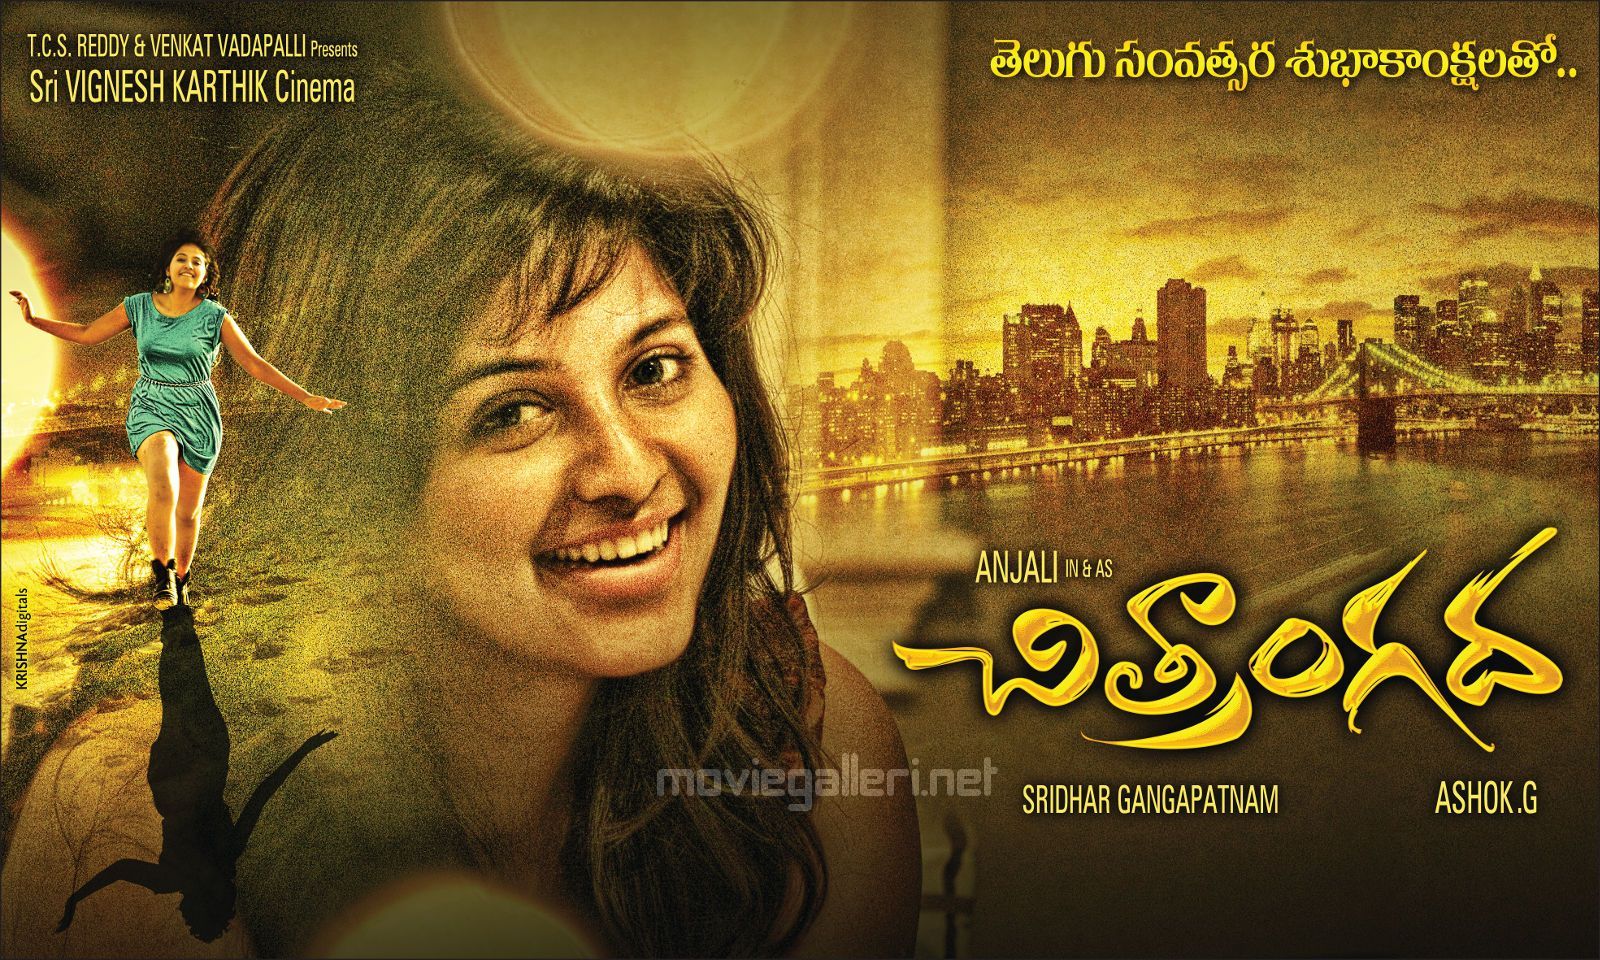 Vallavan Film Theme Music Download - asmerdesert's diary